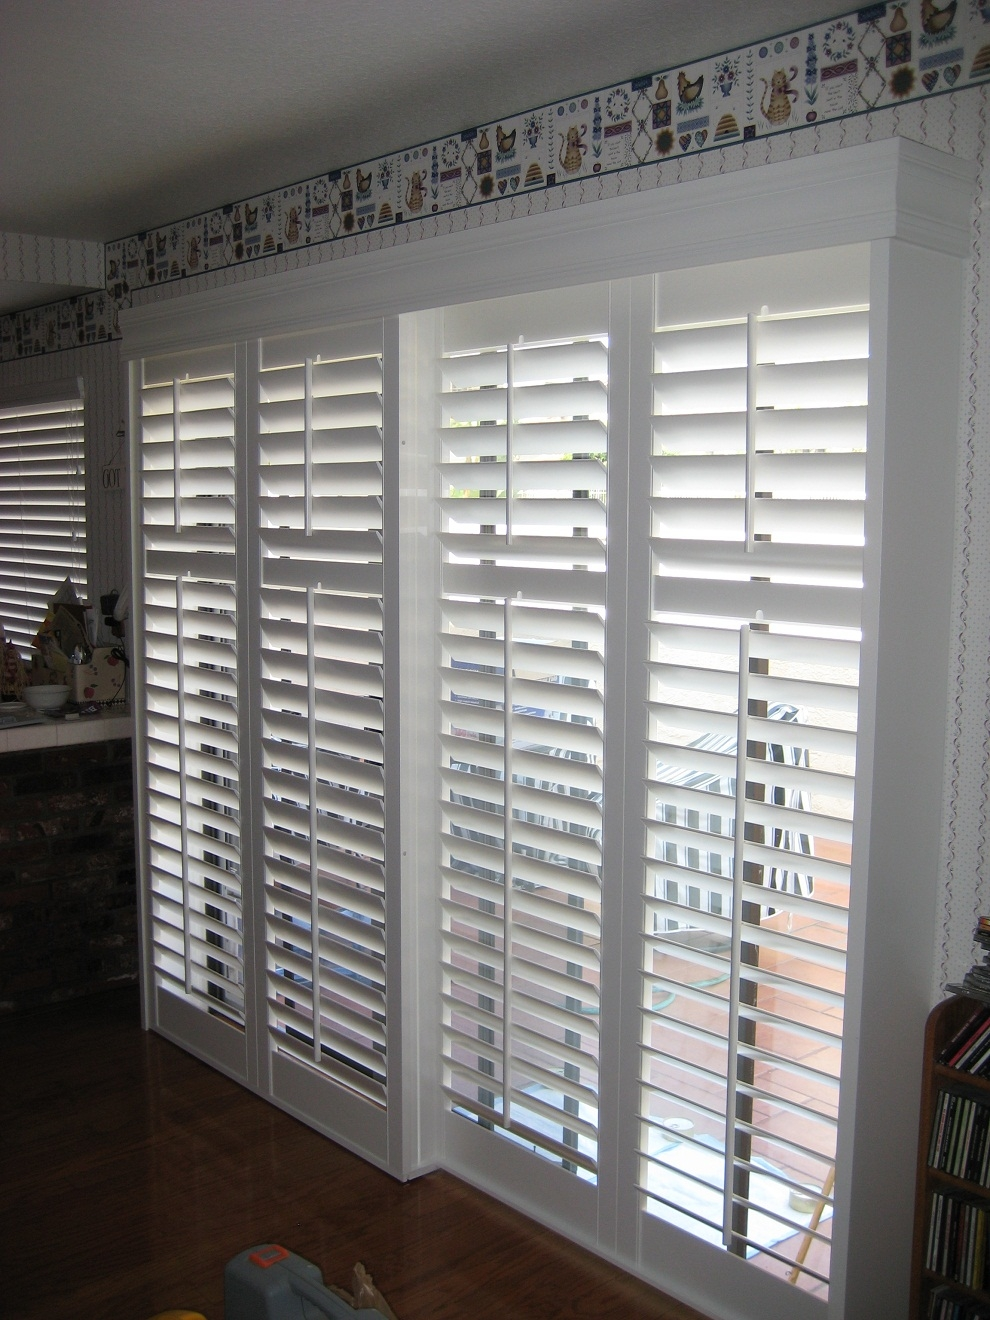 Horizontal Wood Blinds Sliding Glass DoorsHorizontal Wood Blinds Sliding Glass Doors